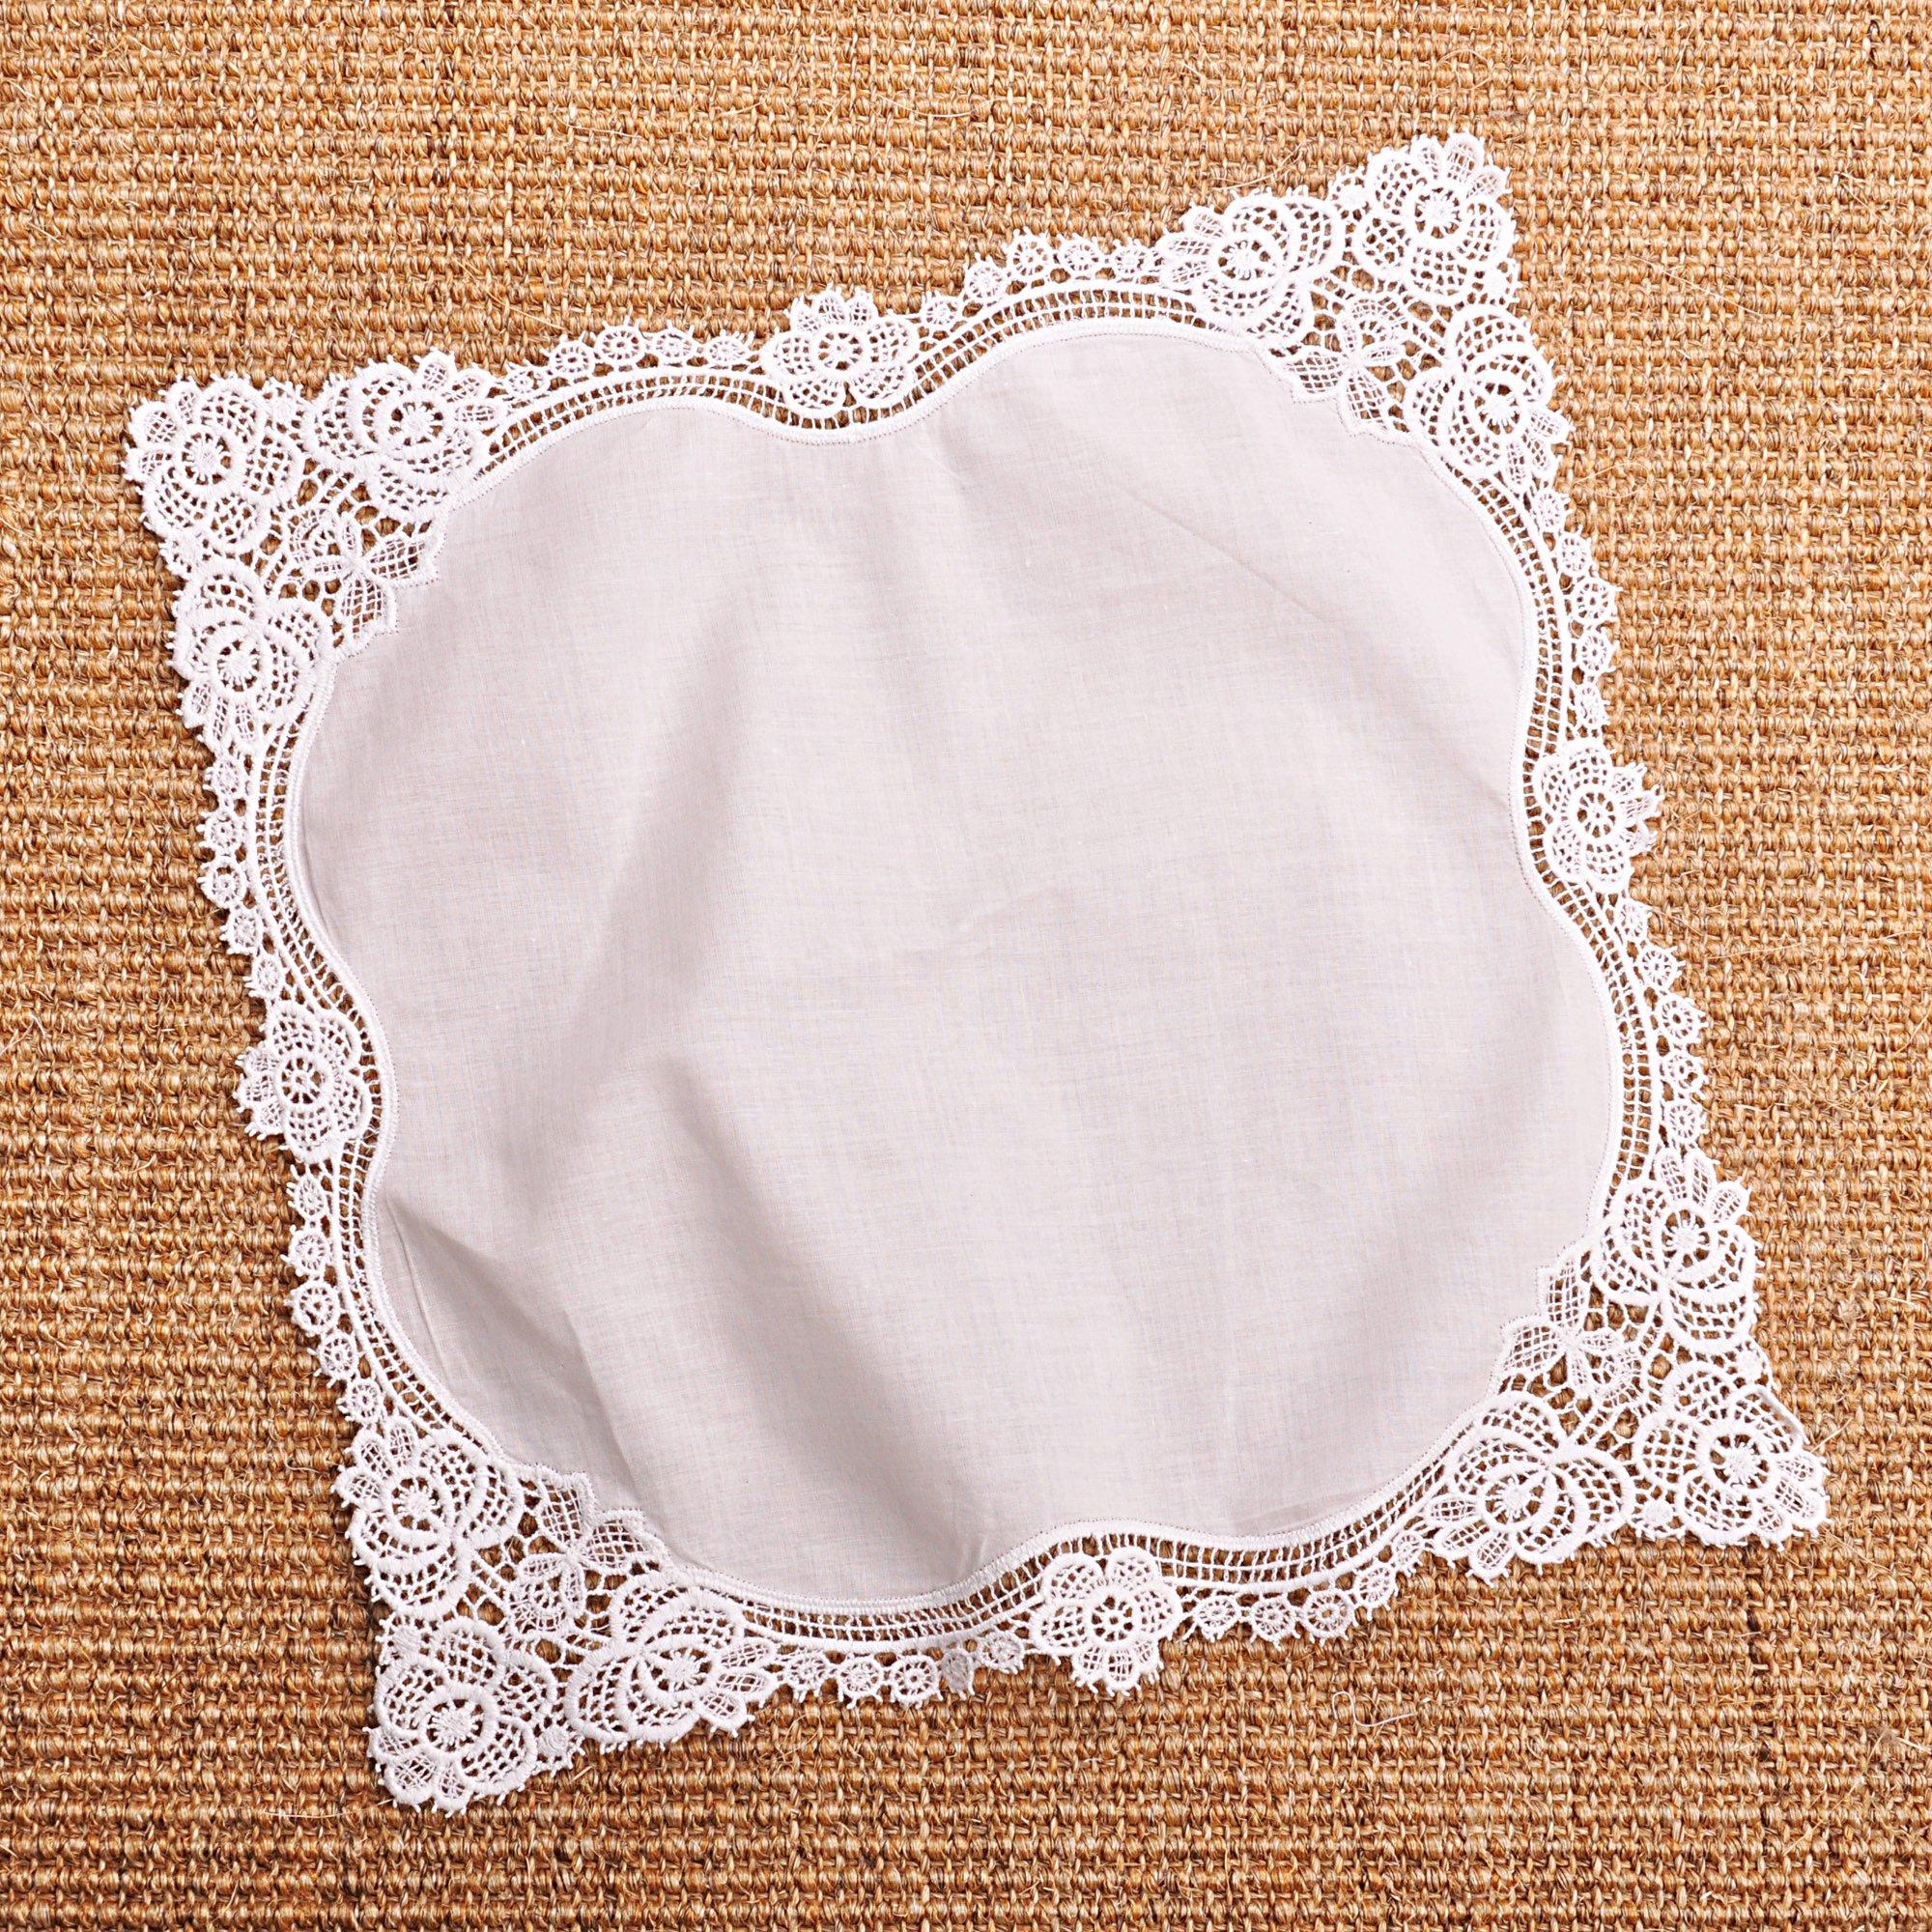 Milesky Bridal Wedding Crochet Lace Handkerchief Premium 60S Cotton CH02 by Milesky (Image #4)